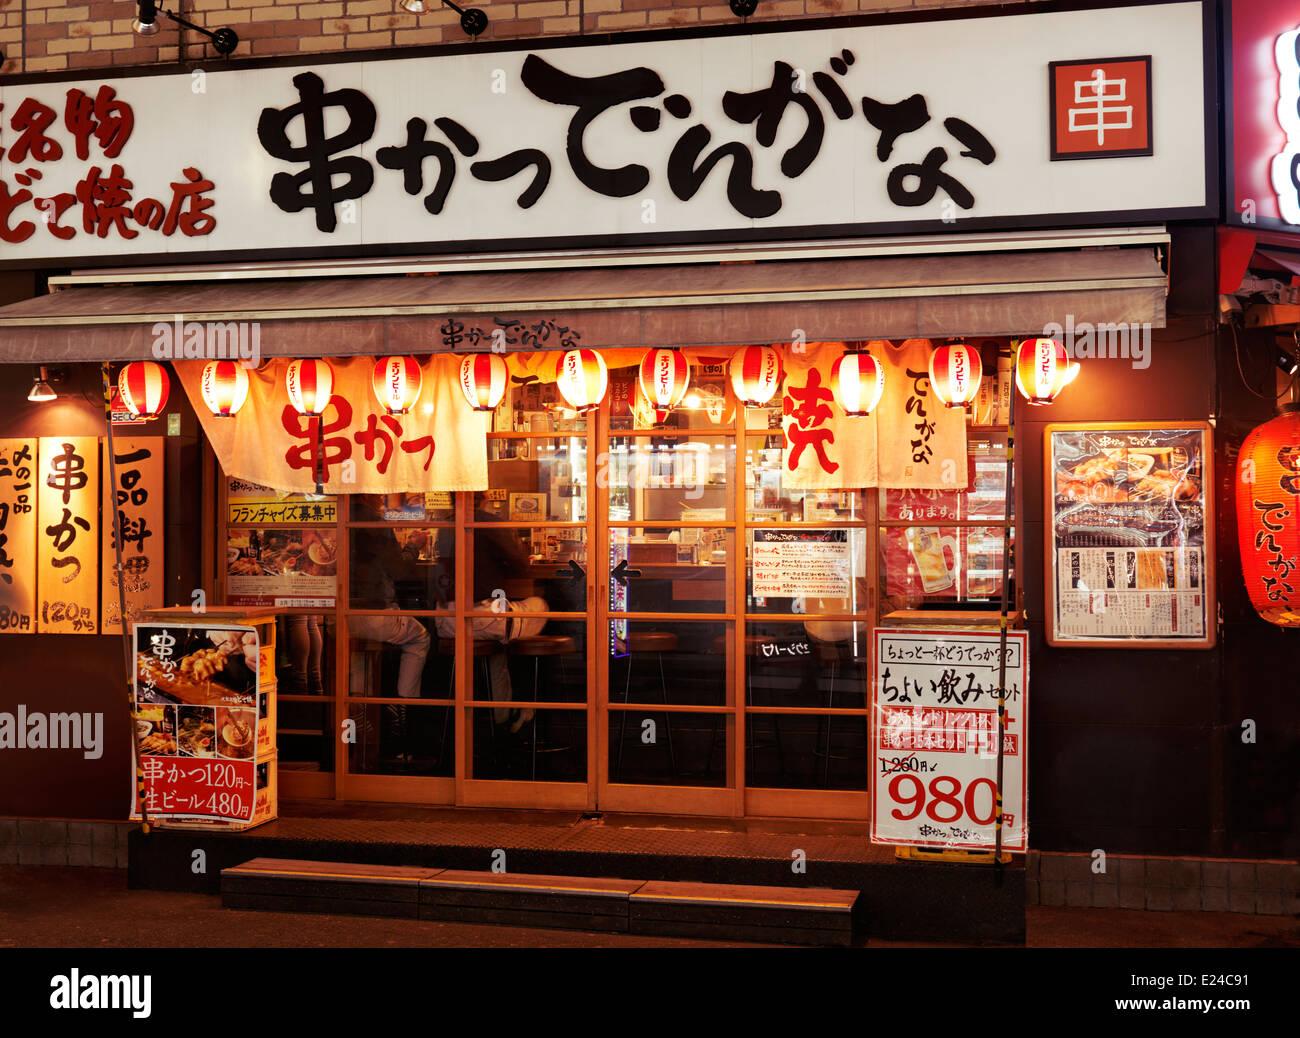 Food Restaurant Signs In Japan